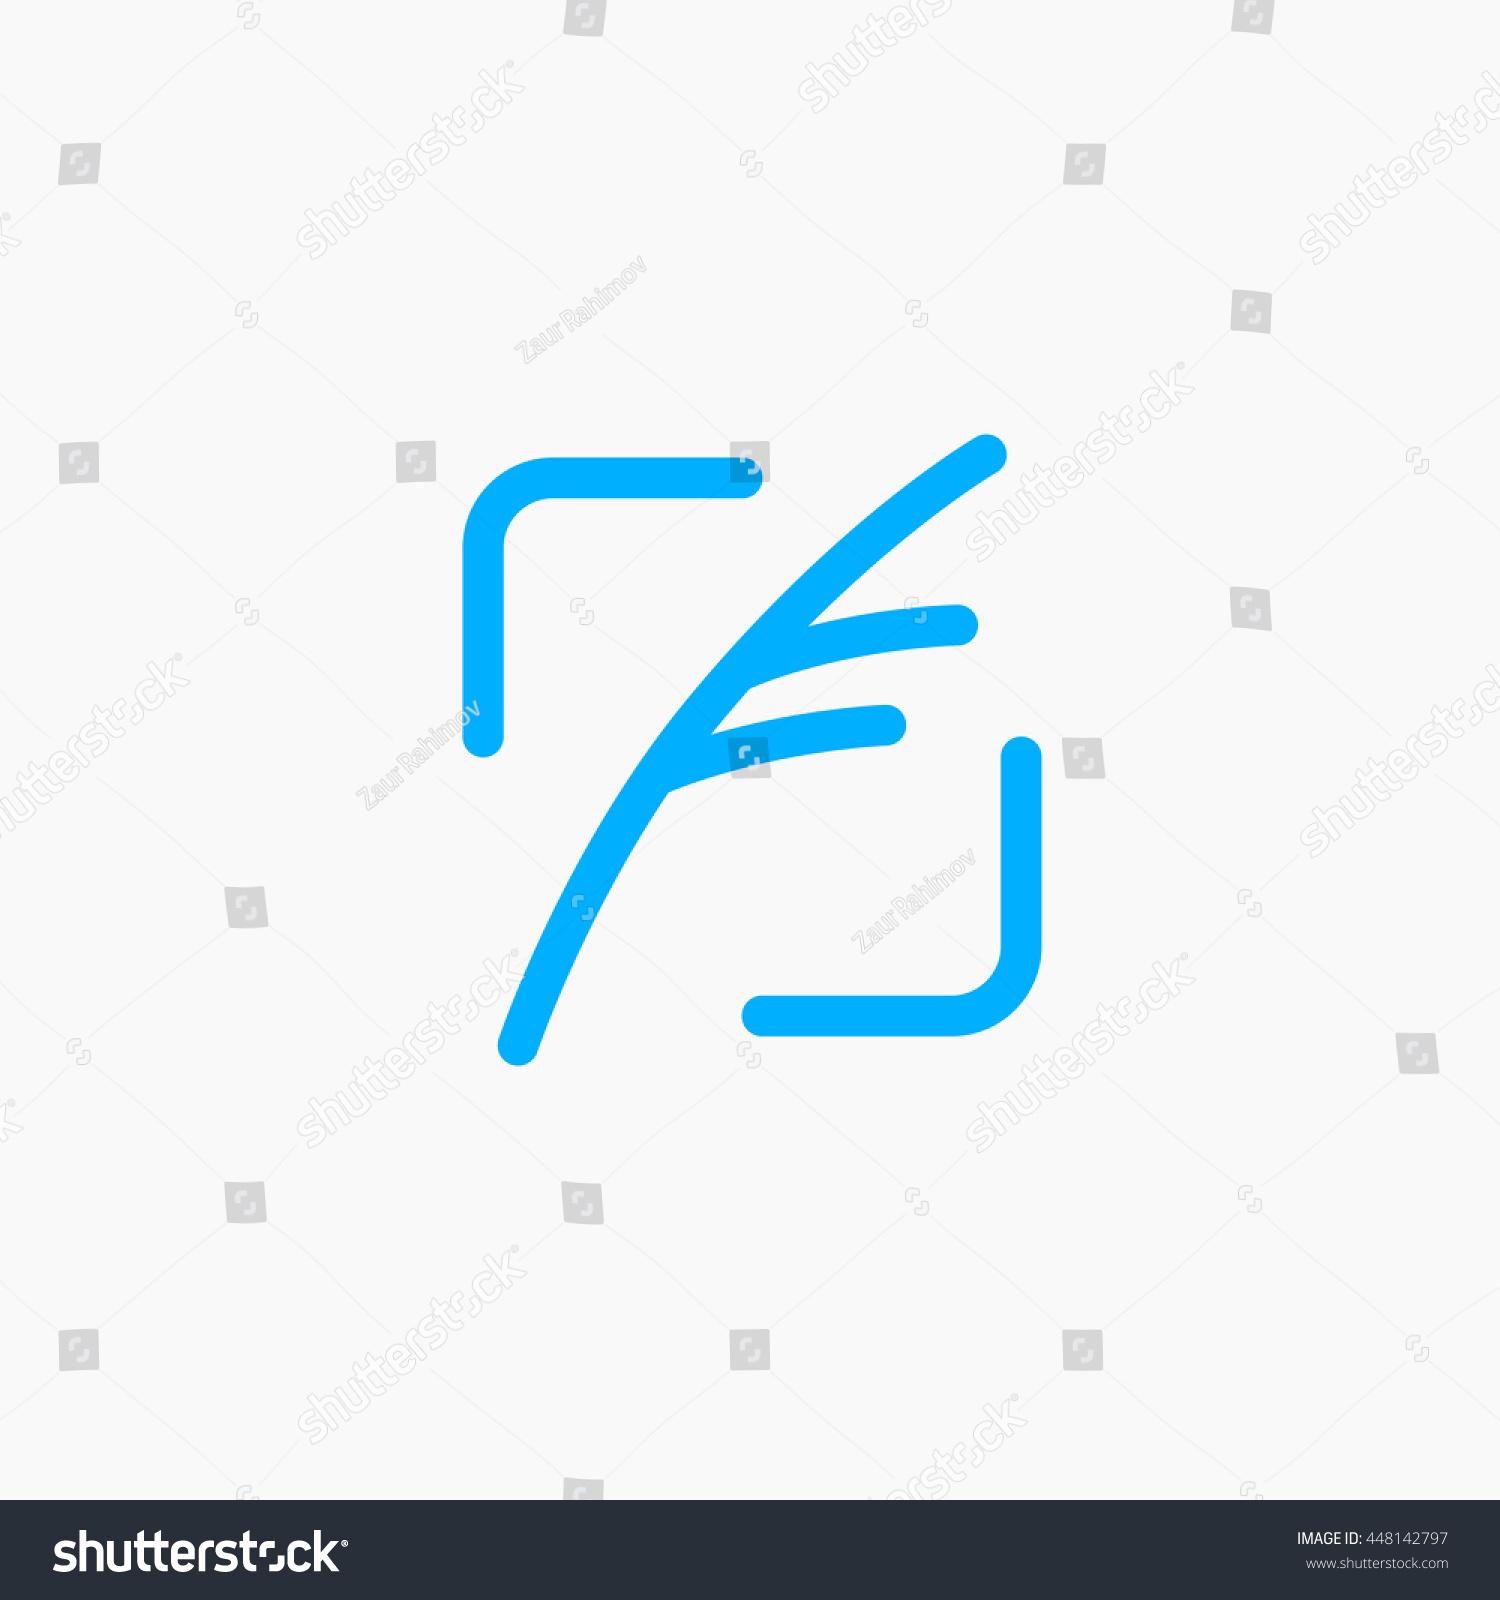 Twitter Twt Signs Twit Logo Ui Stock Vector 448142797 Shutterstock